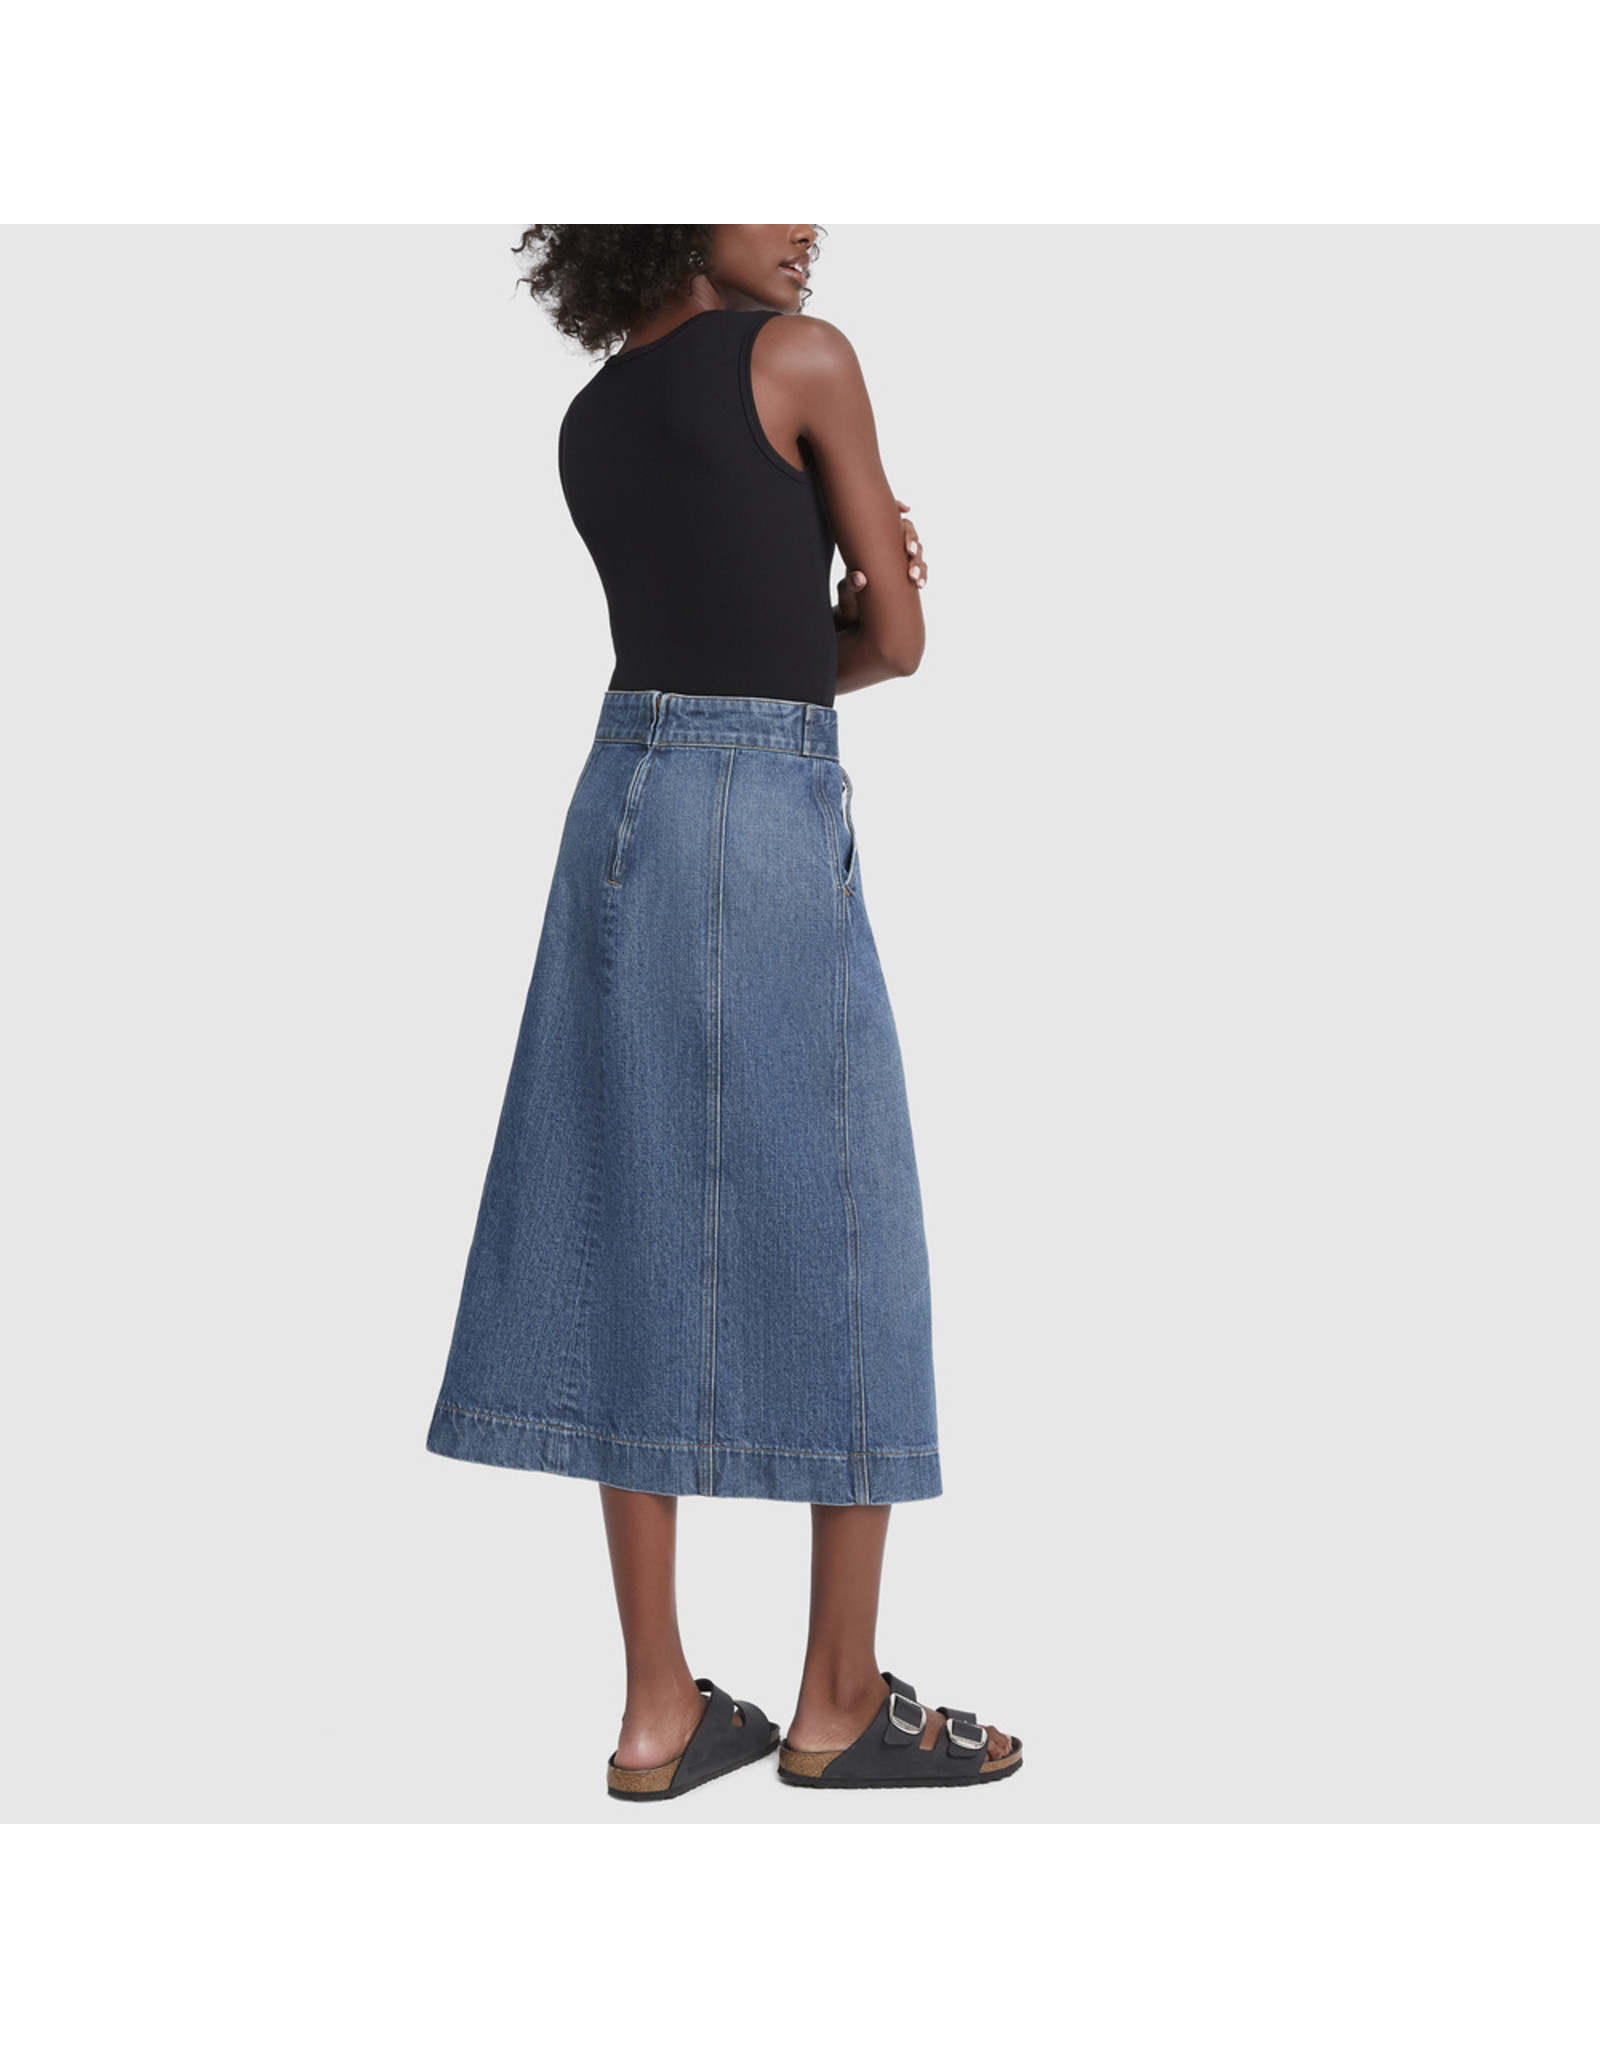 G. Label G. Label Amanda Bodysuit Tall (Color: Black, Size: S)